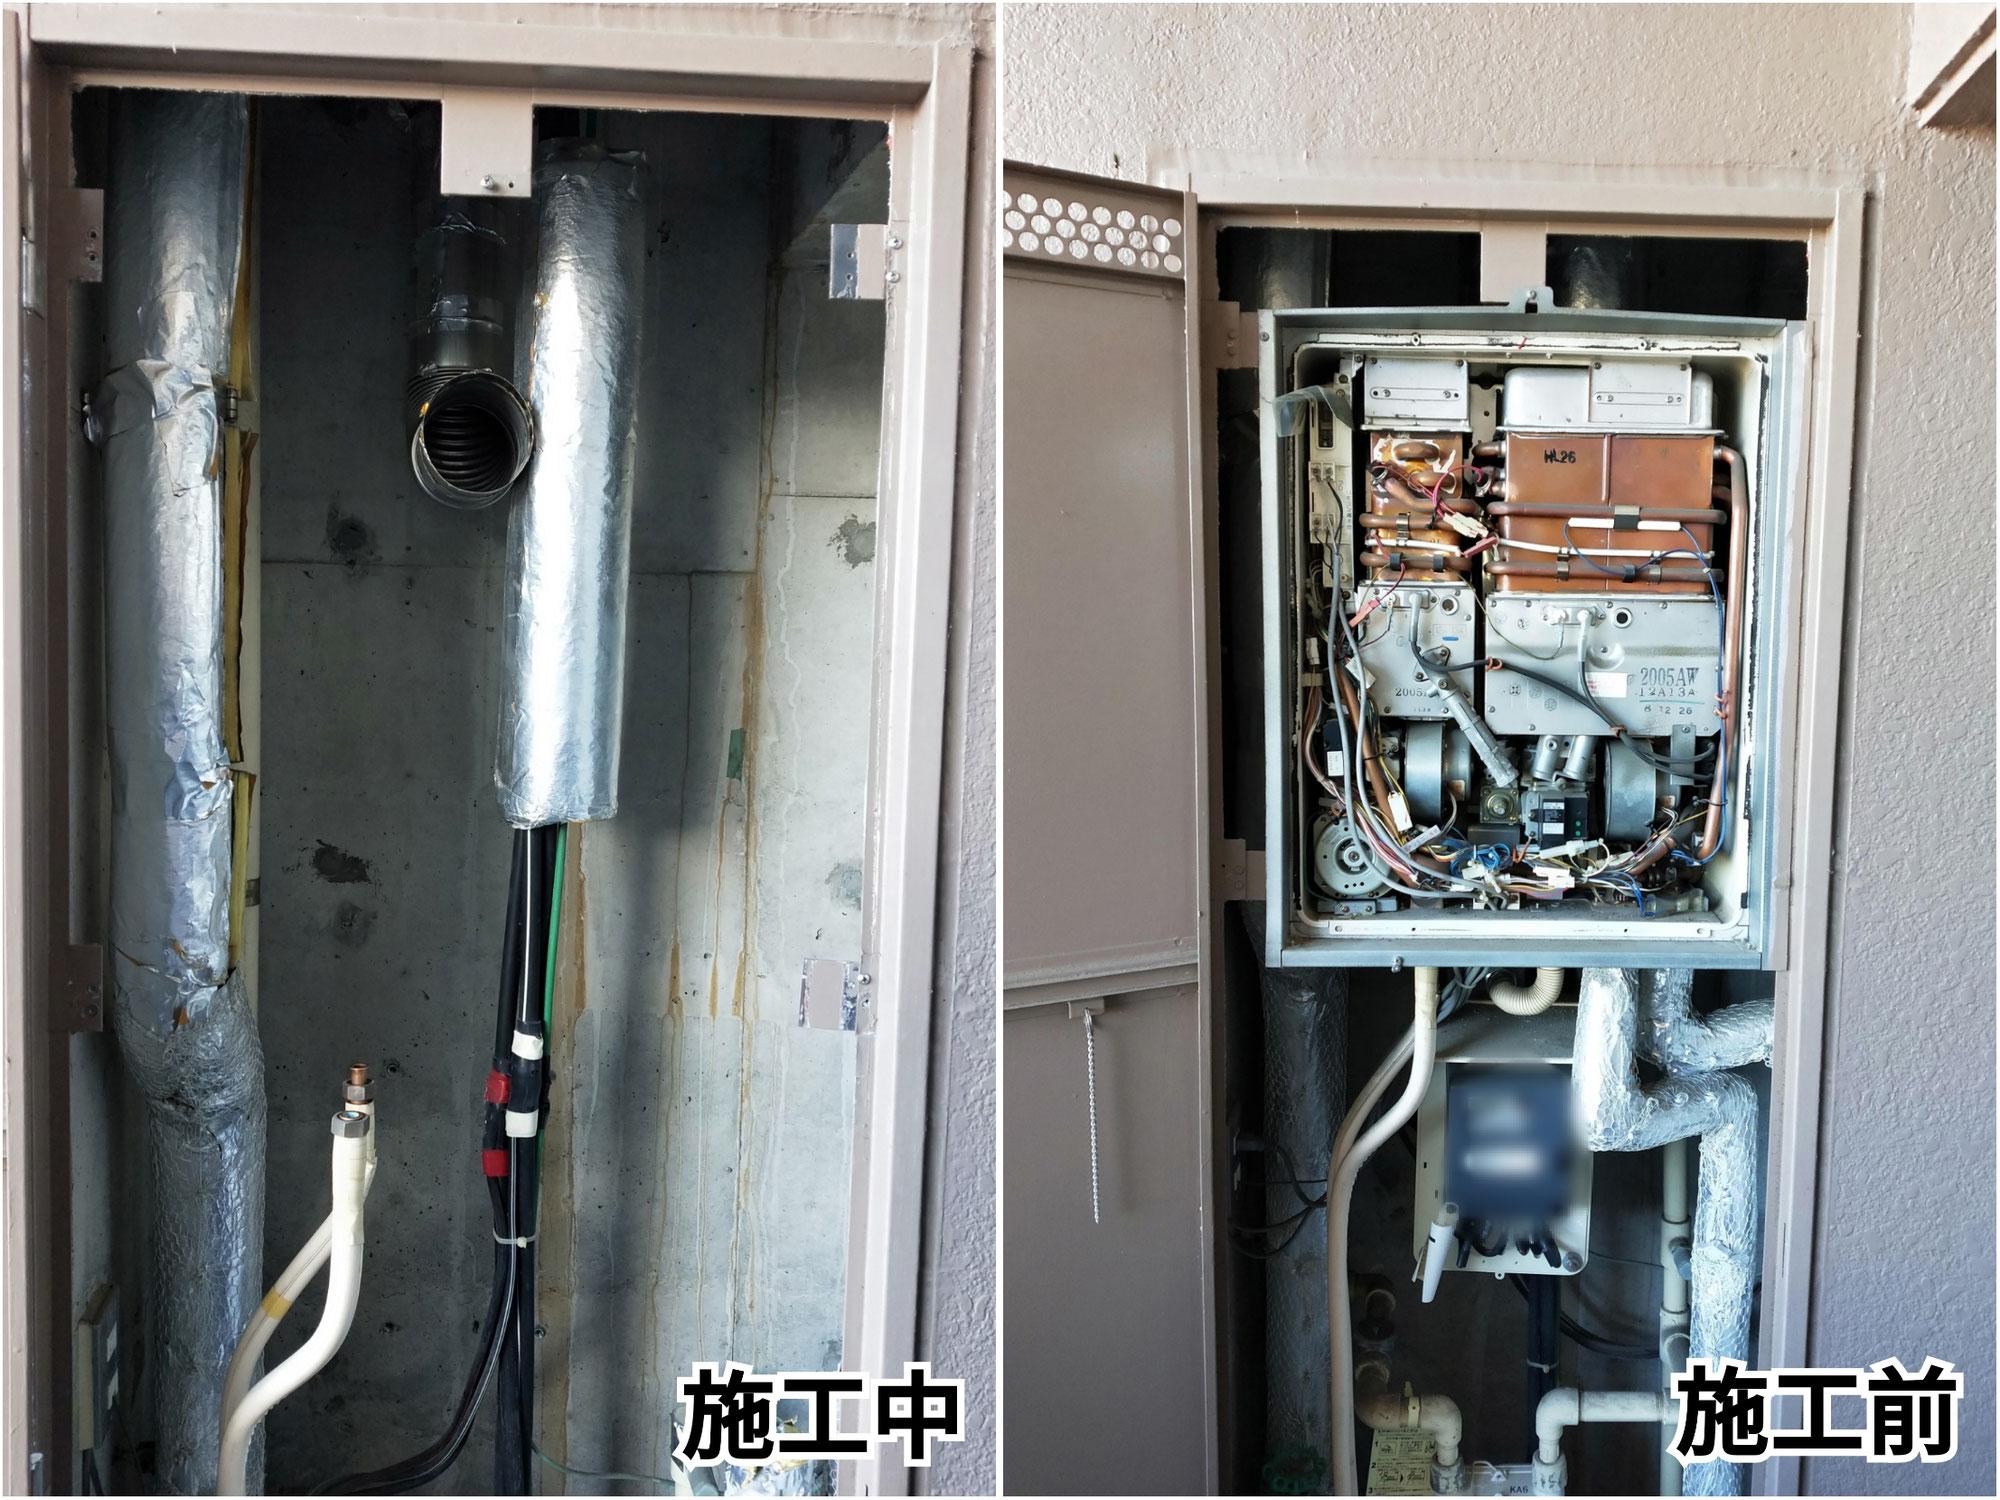 PS扉内後方排気型ふろ給湯器を取替①